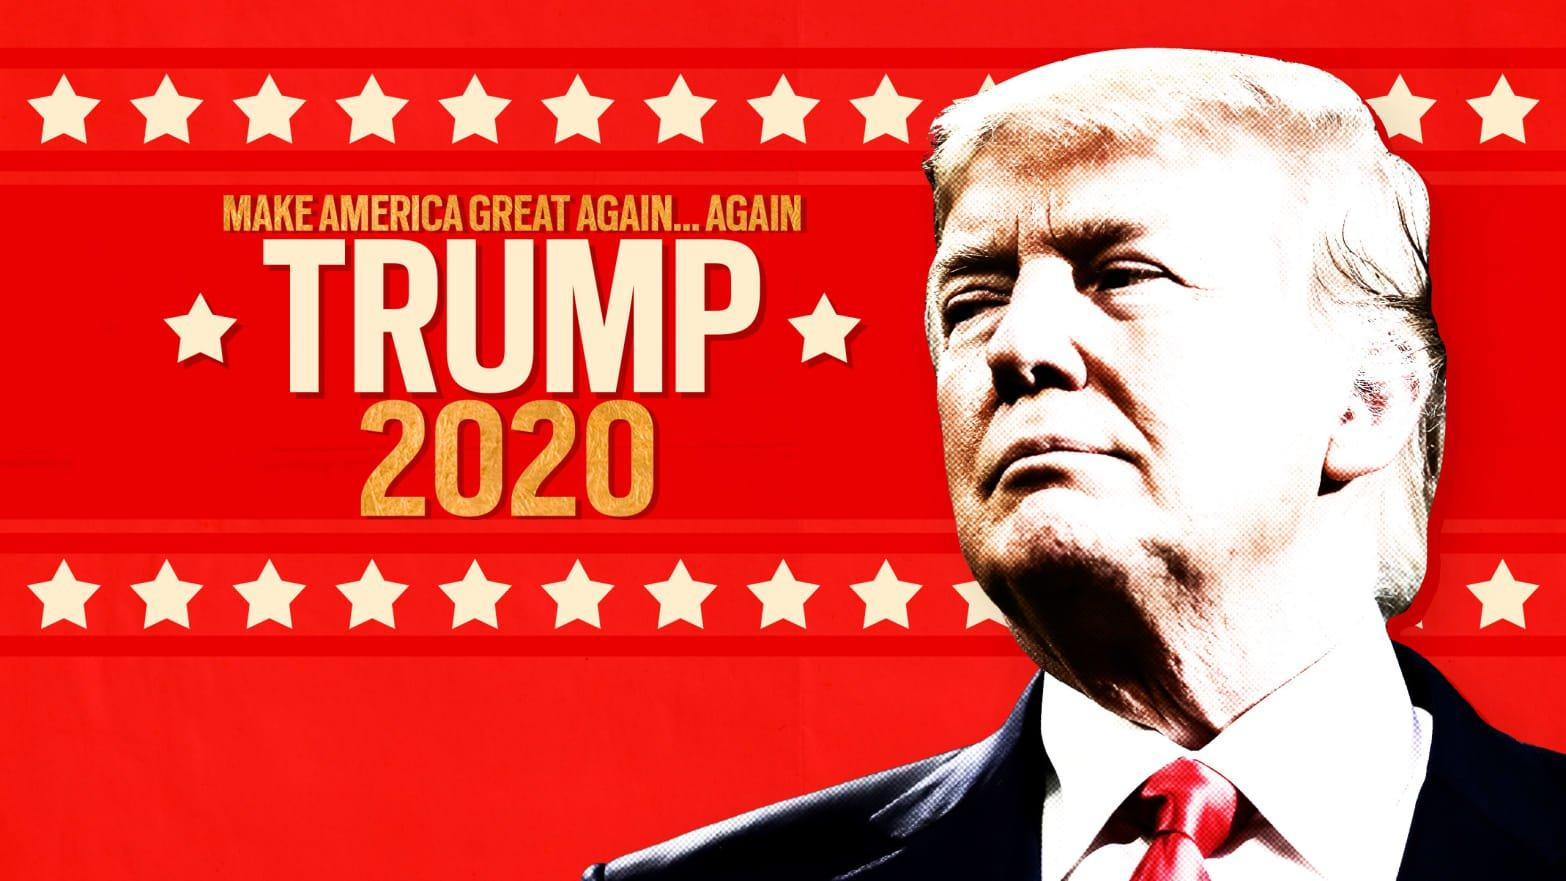 Trump 2020 Wallpapers 1566x881